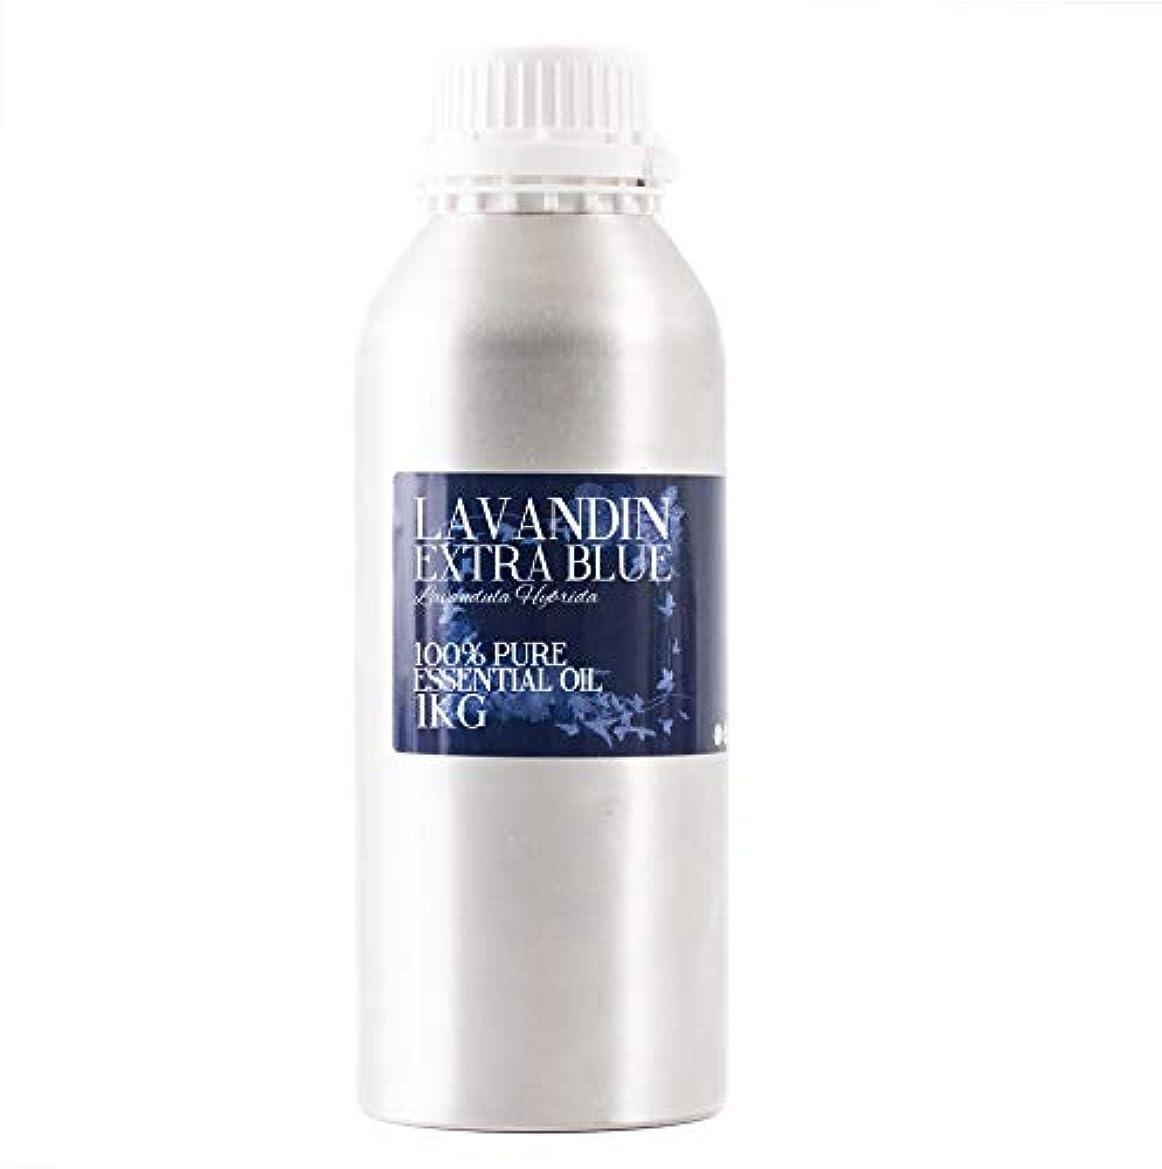 広告主天皇立方体Mystic Moments | Lavandin Extra Blue Essential Oil - 1Kg - 100% Pure